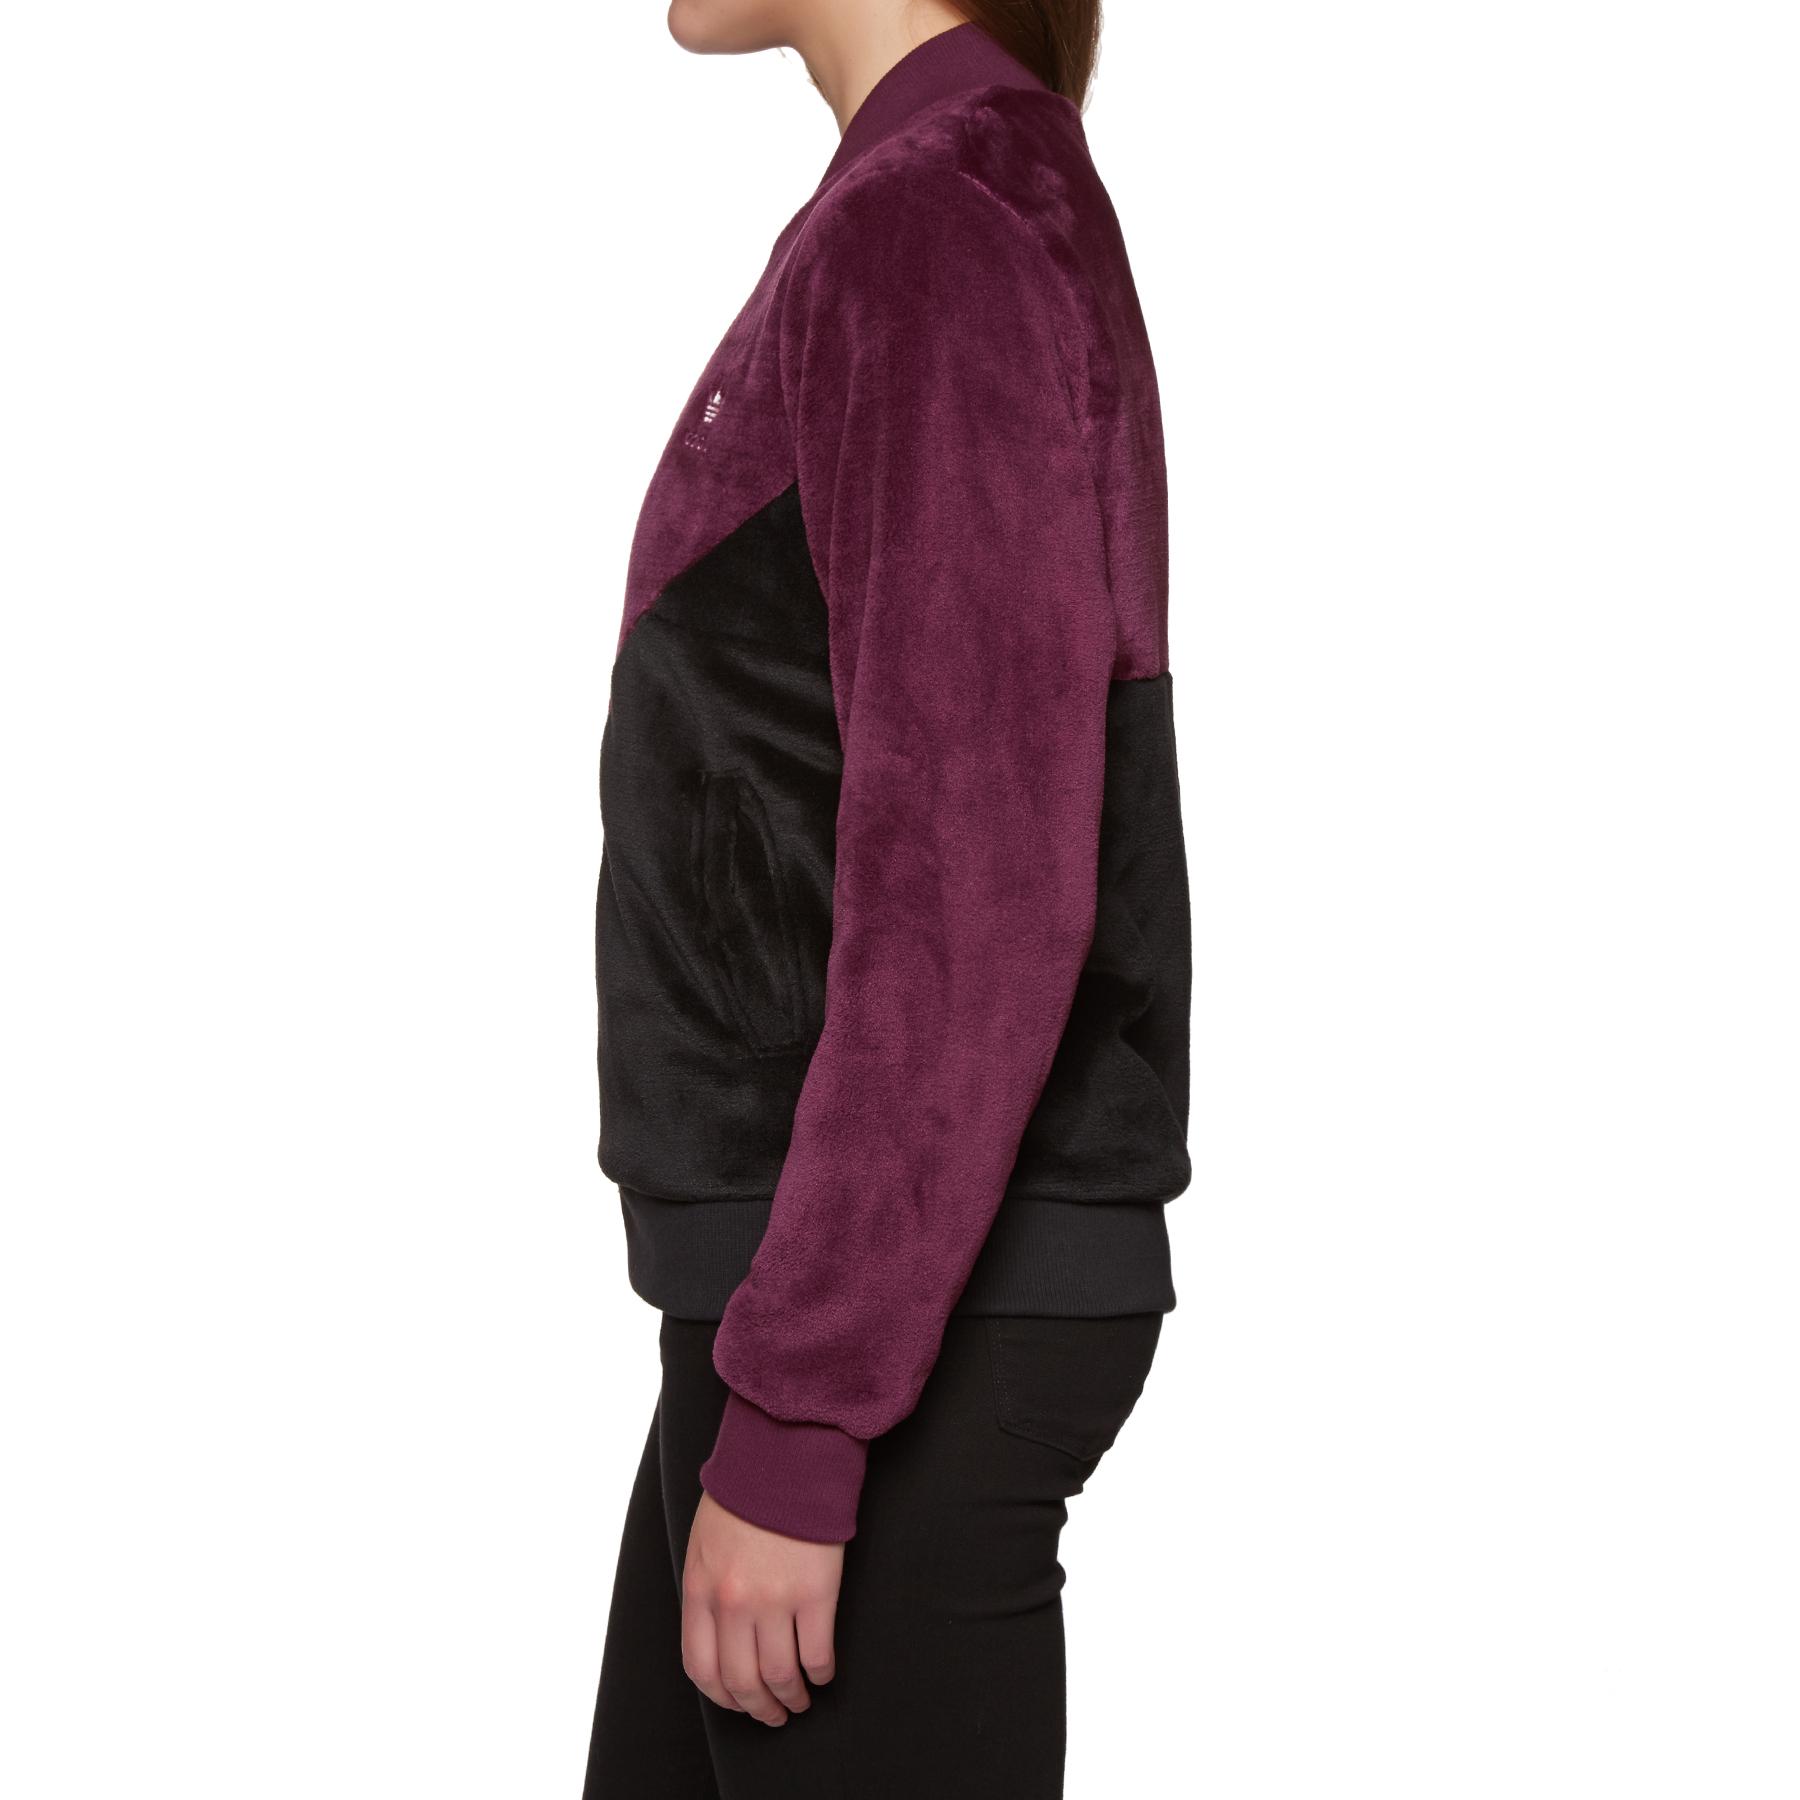 adidas originals clrdo fleece zip-front track jacket